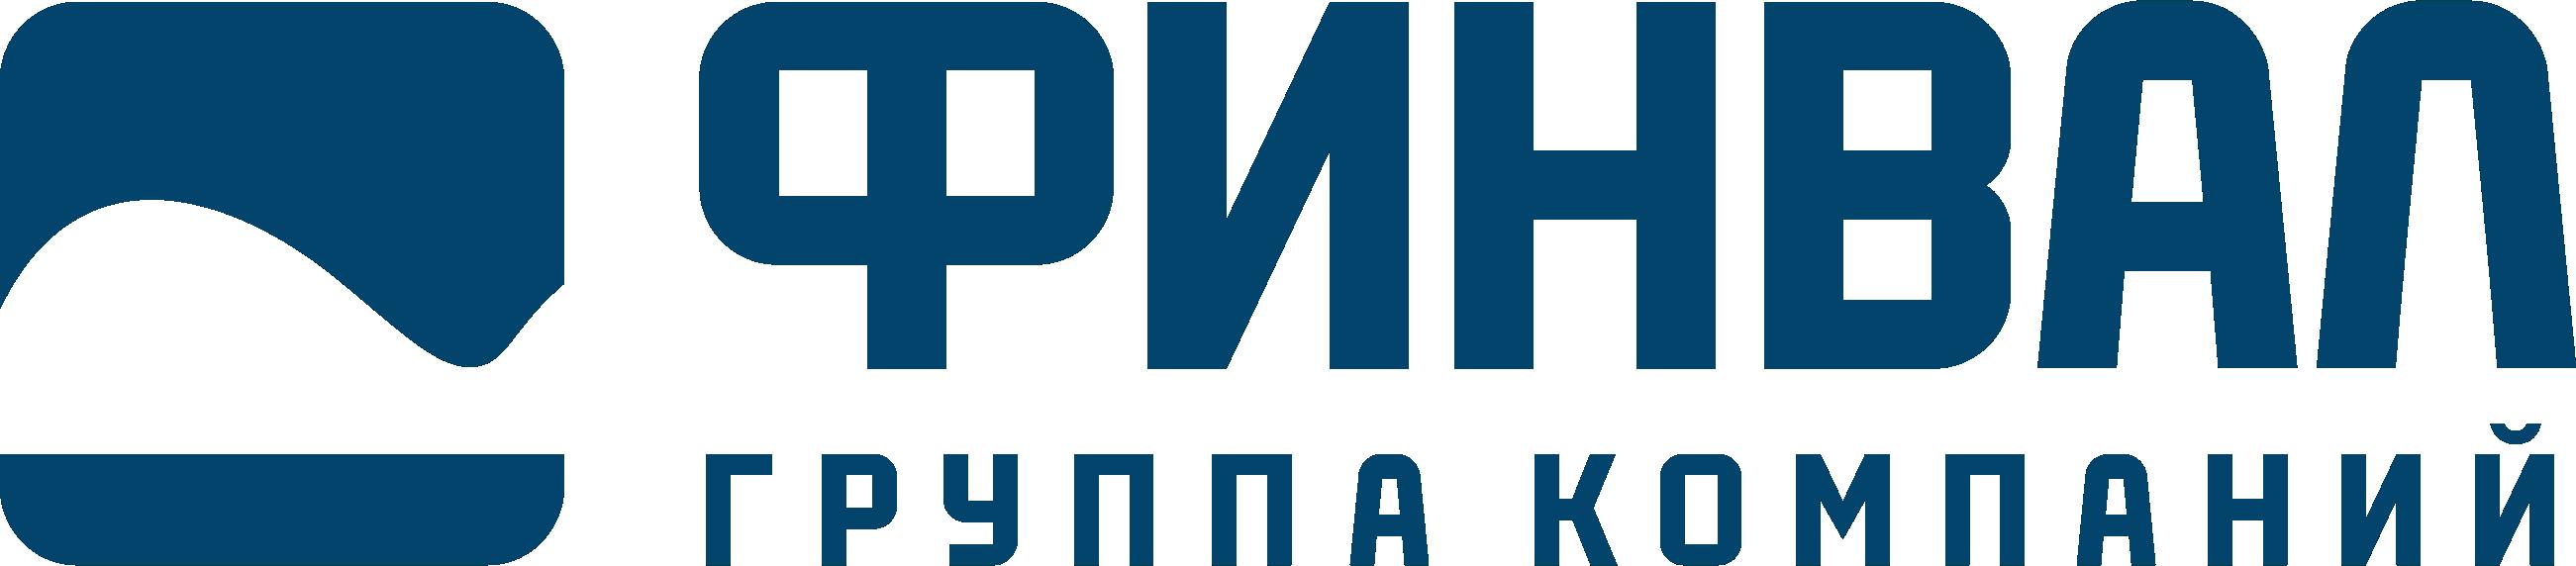 Финвал